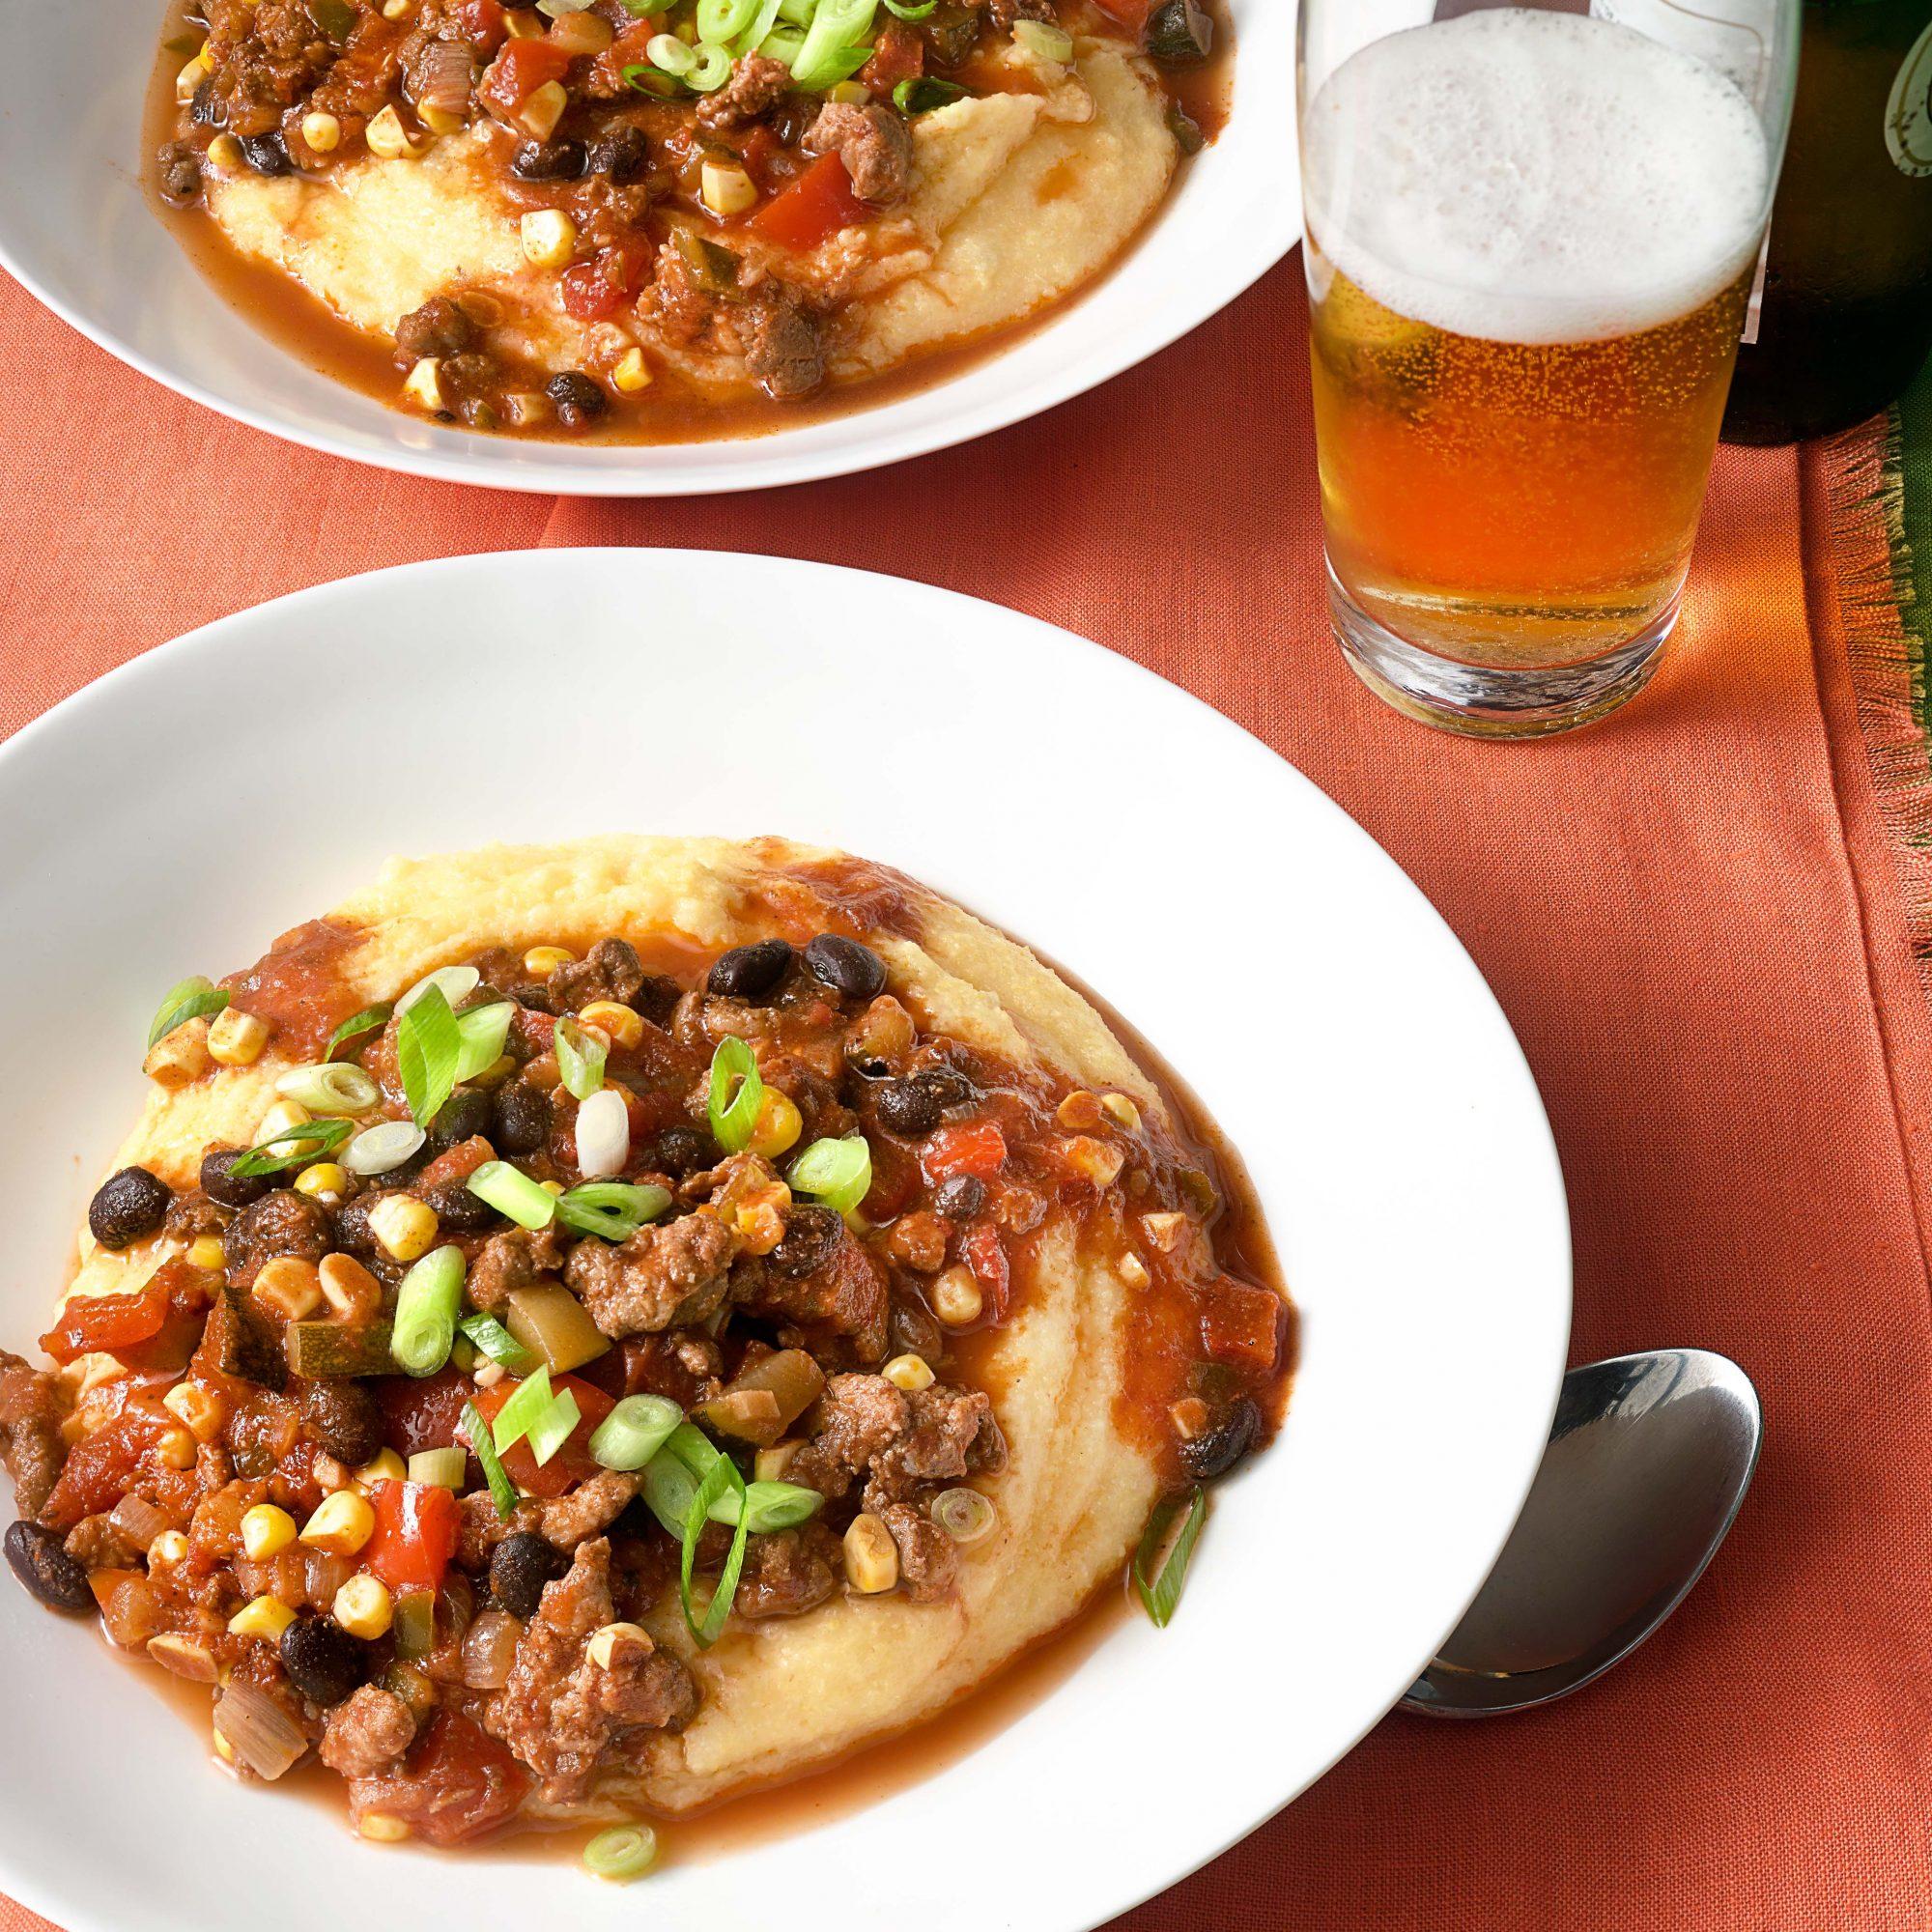 Chorizo & Vegetable Chili in Cheesy Polenta Bowls